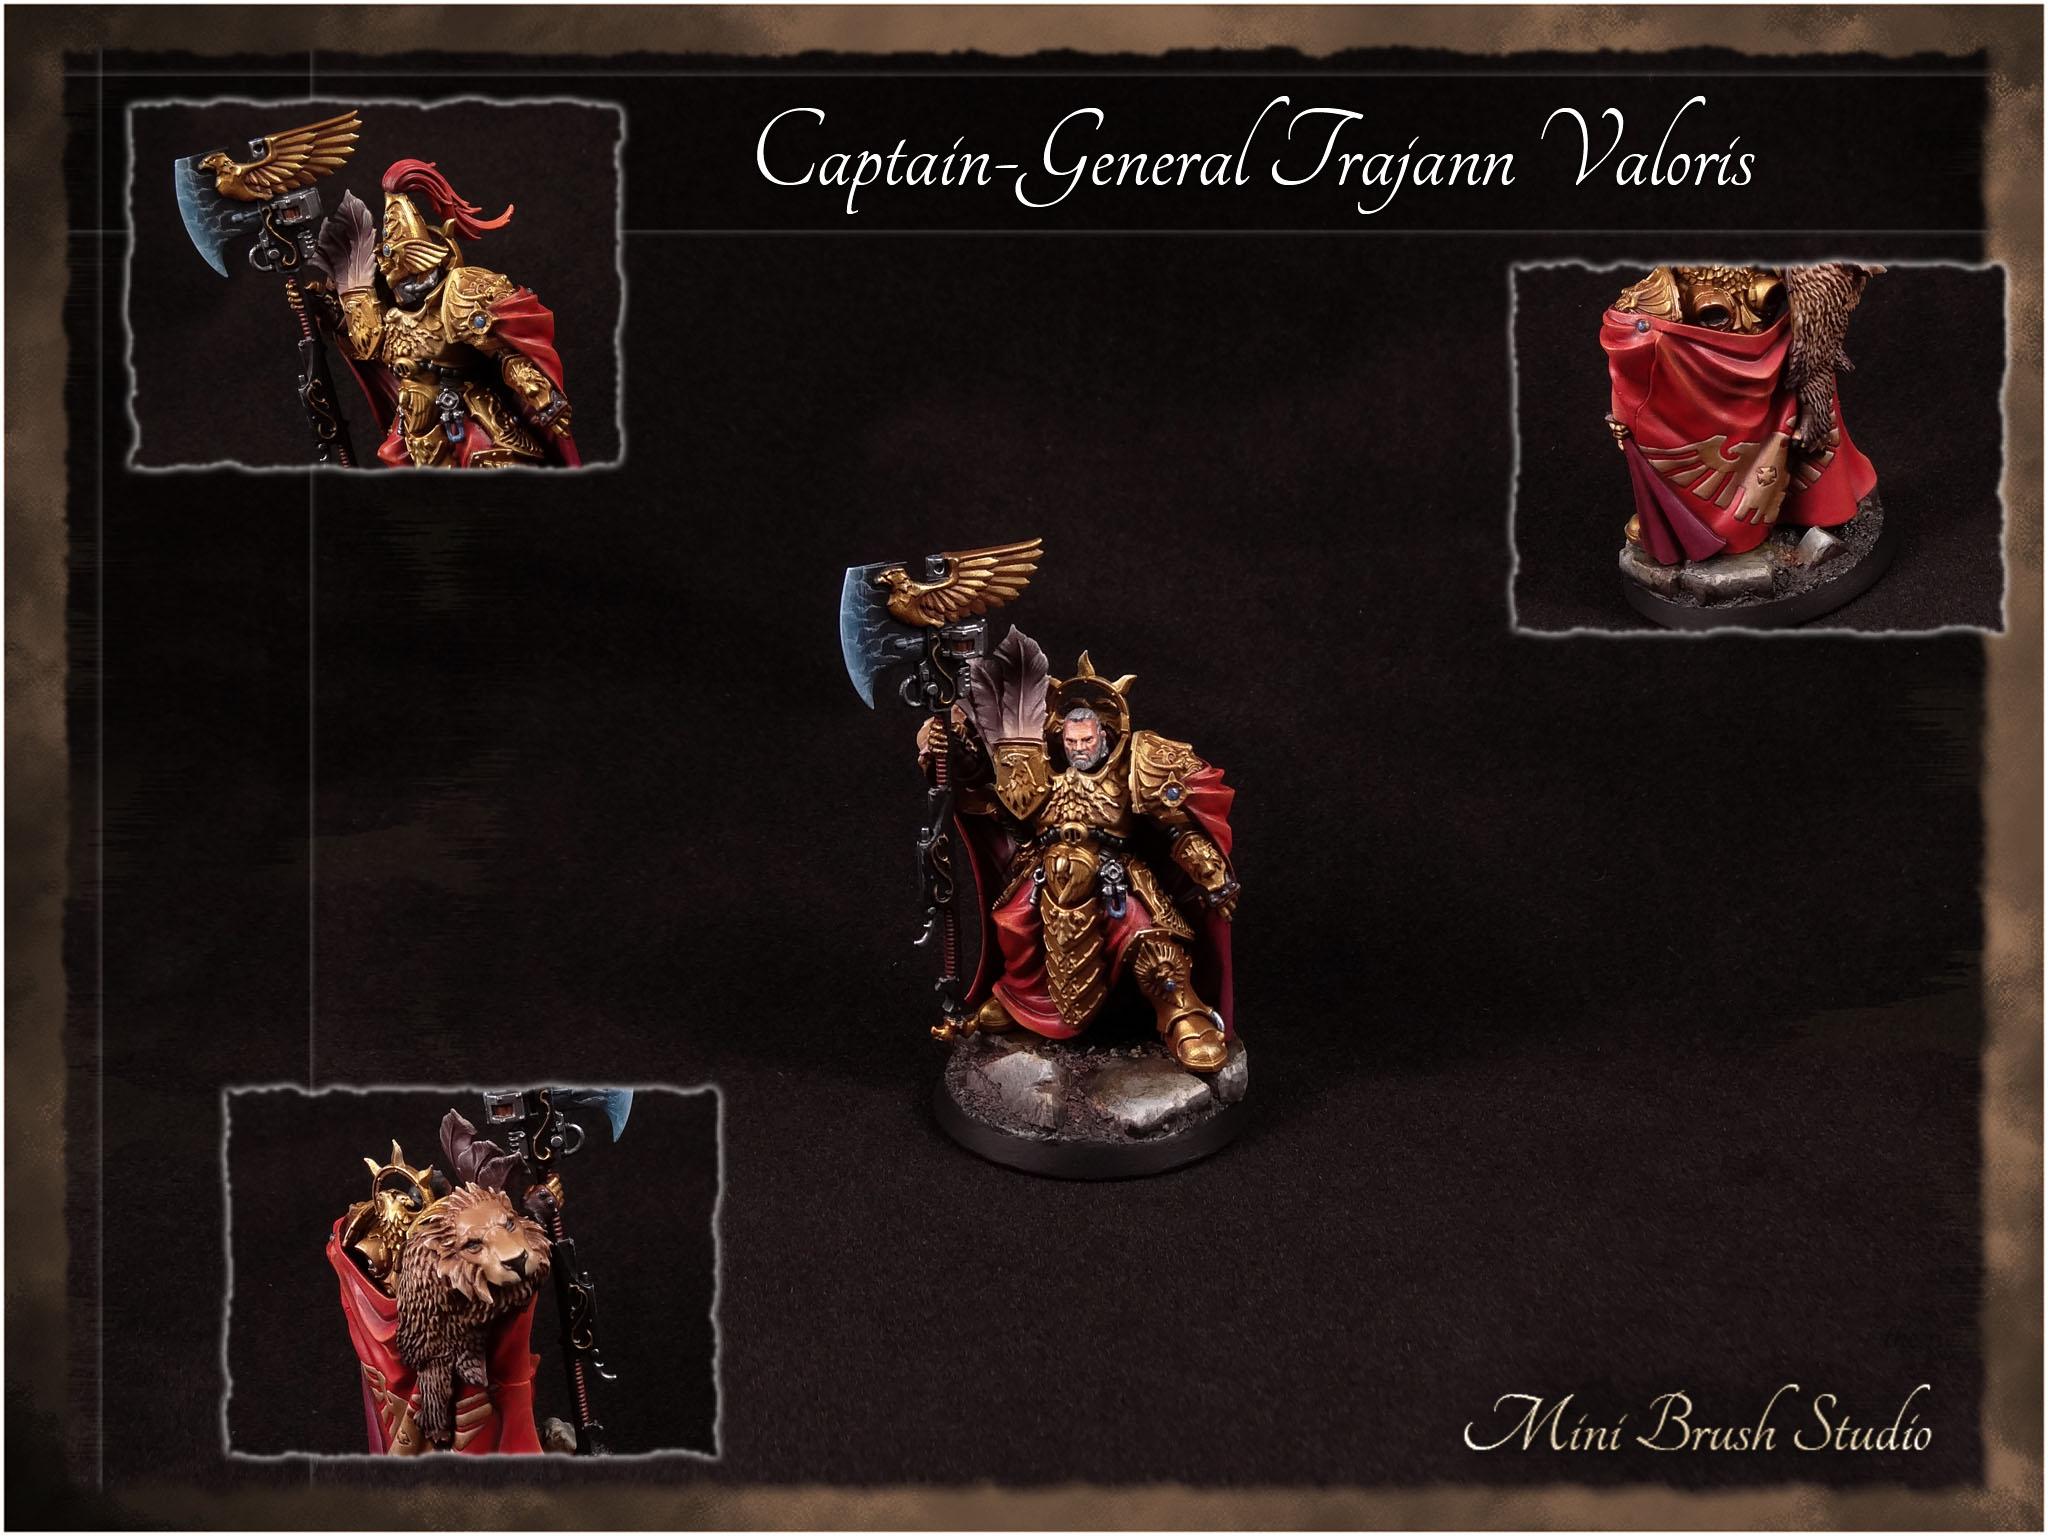 Captain-General Trajann Valoris 1 v7.00.jpg